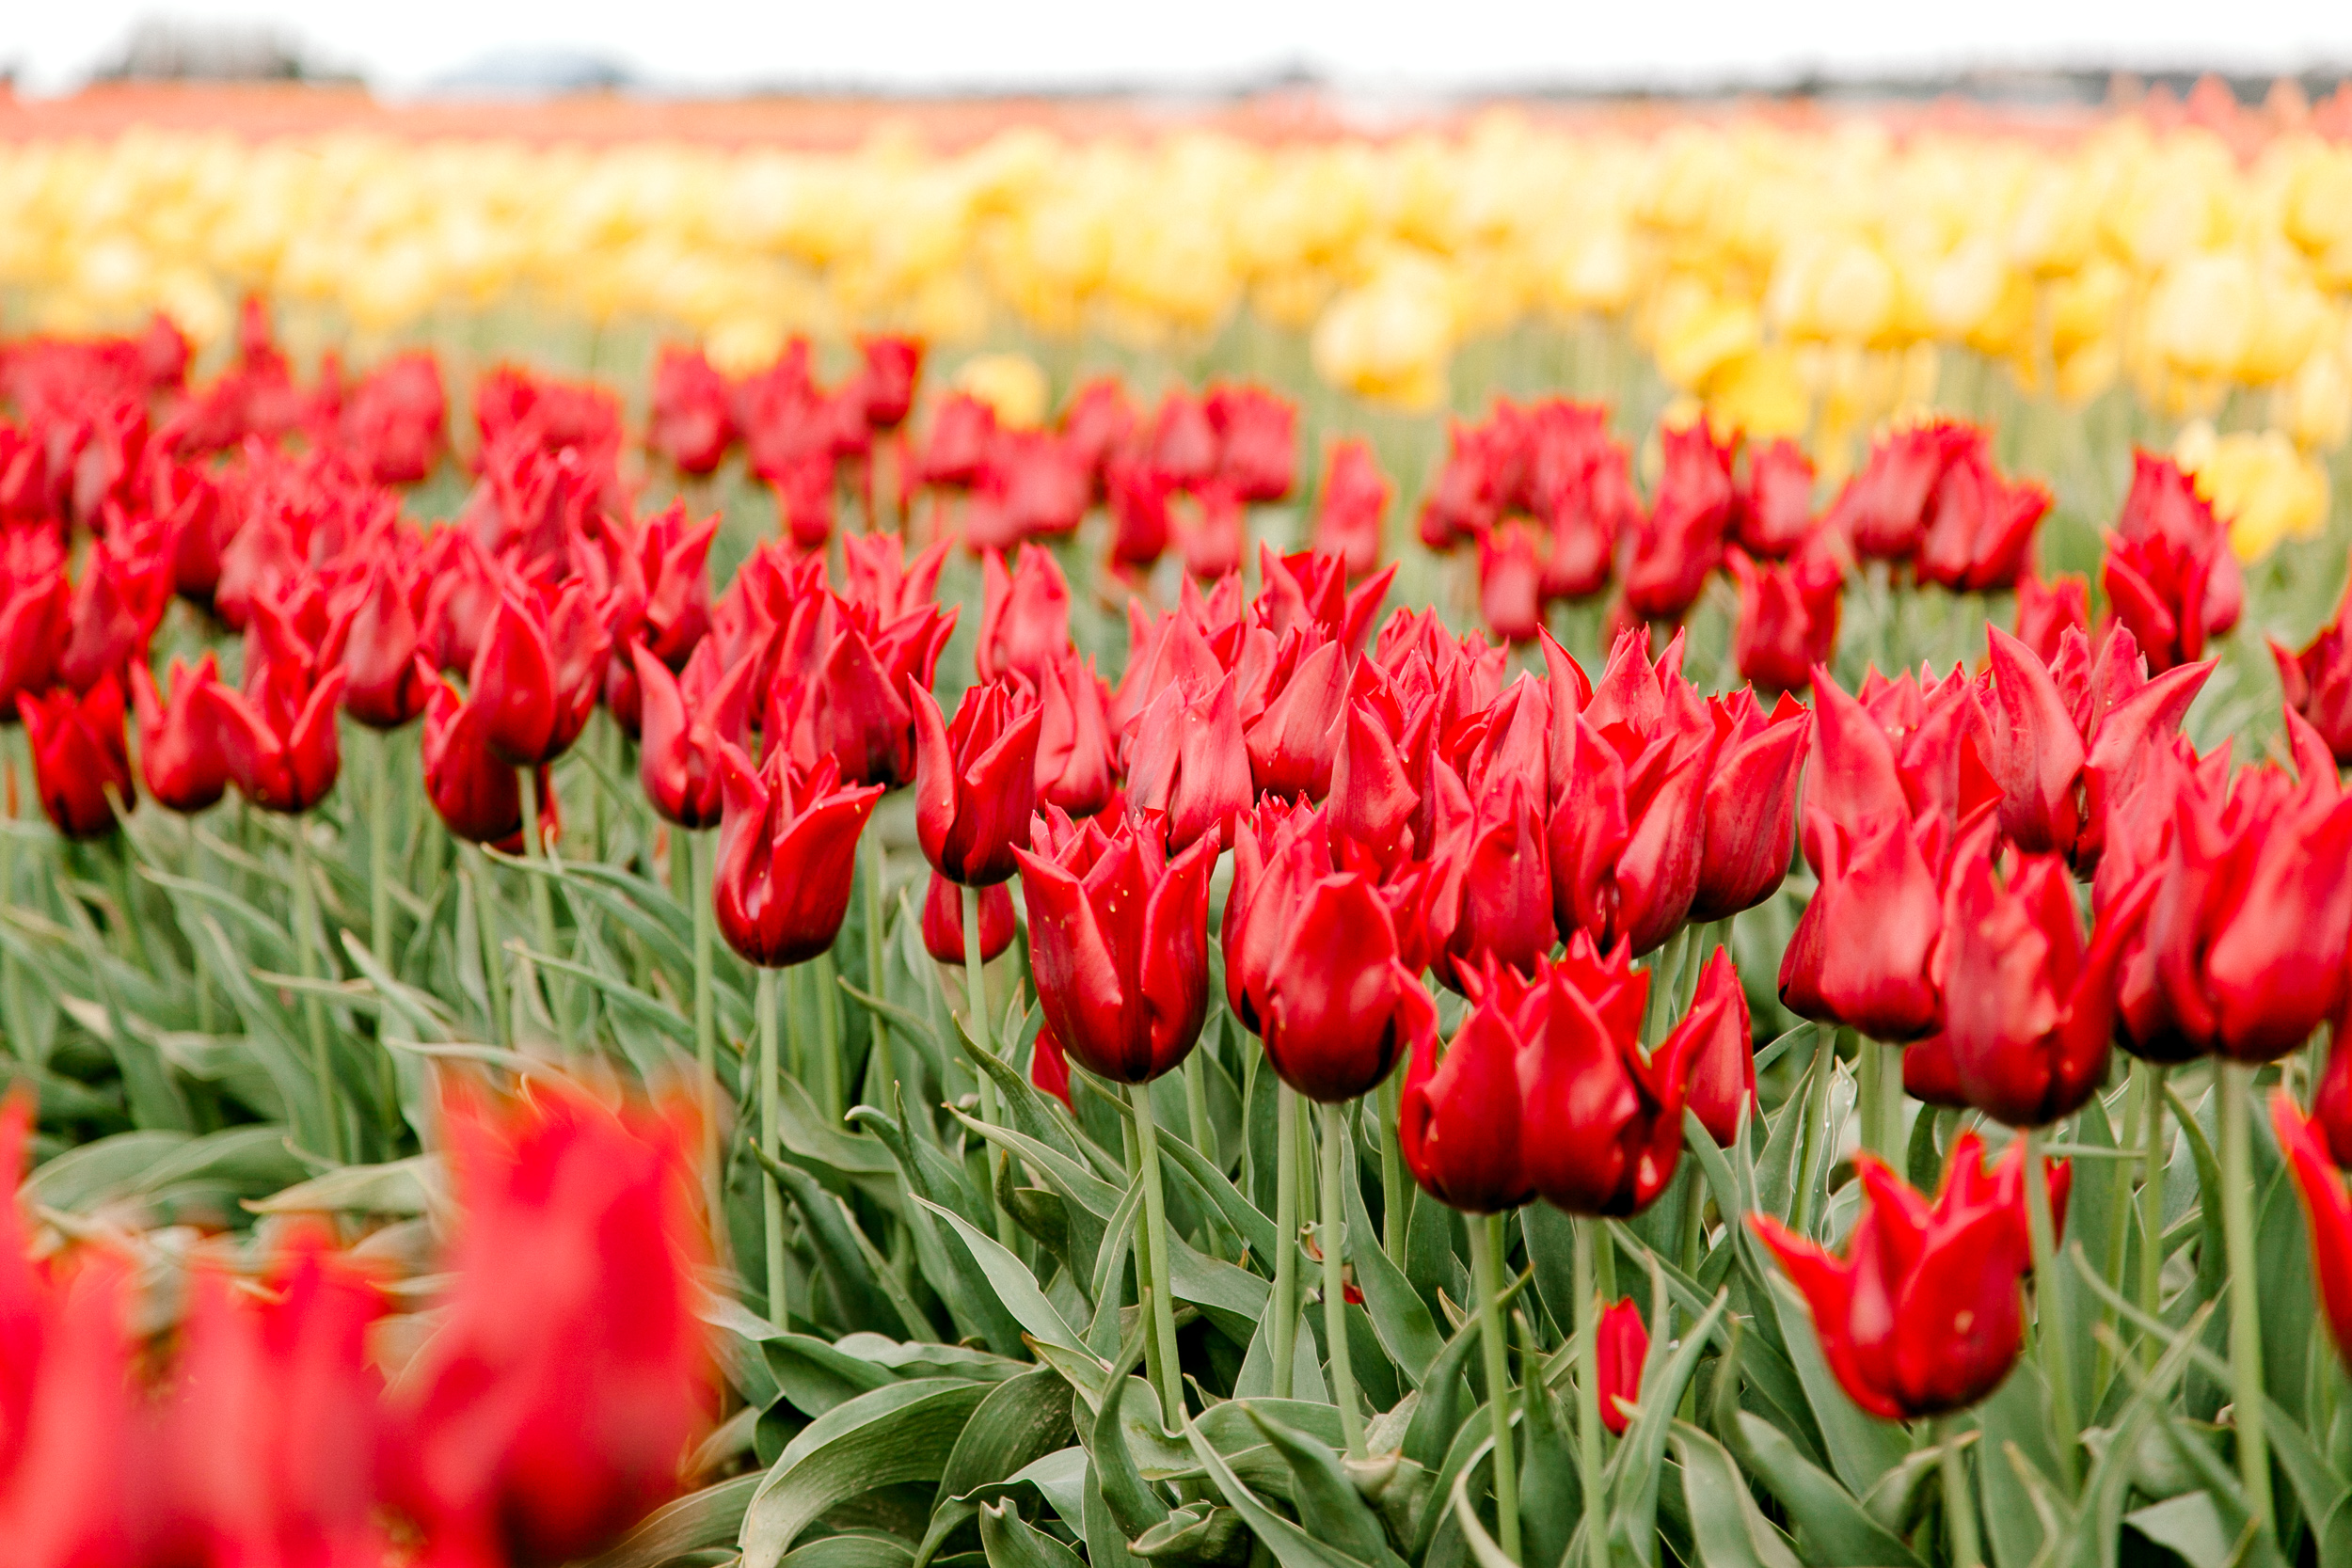 tulips-skagit-wa-abbey-taylor-7.jpg